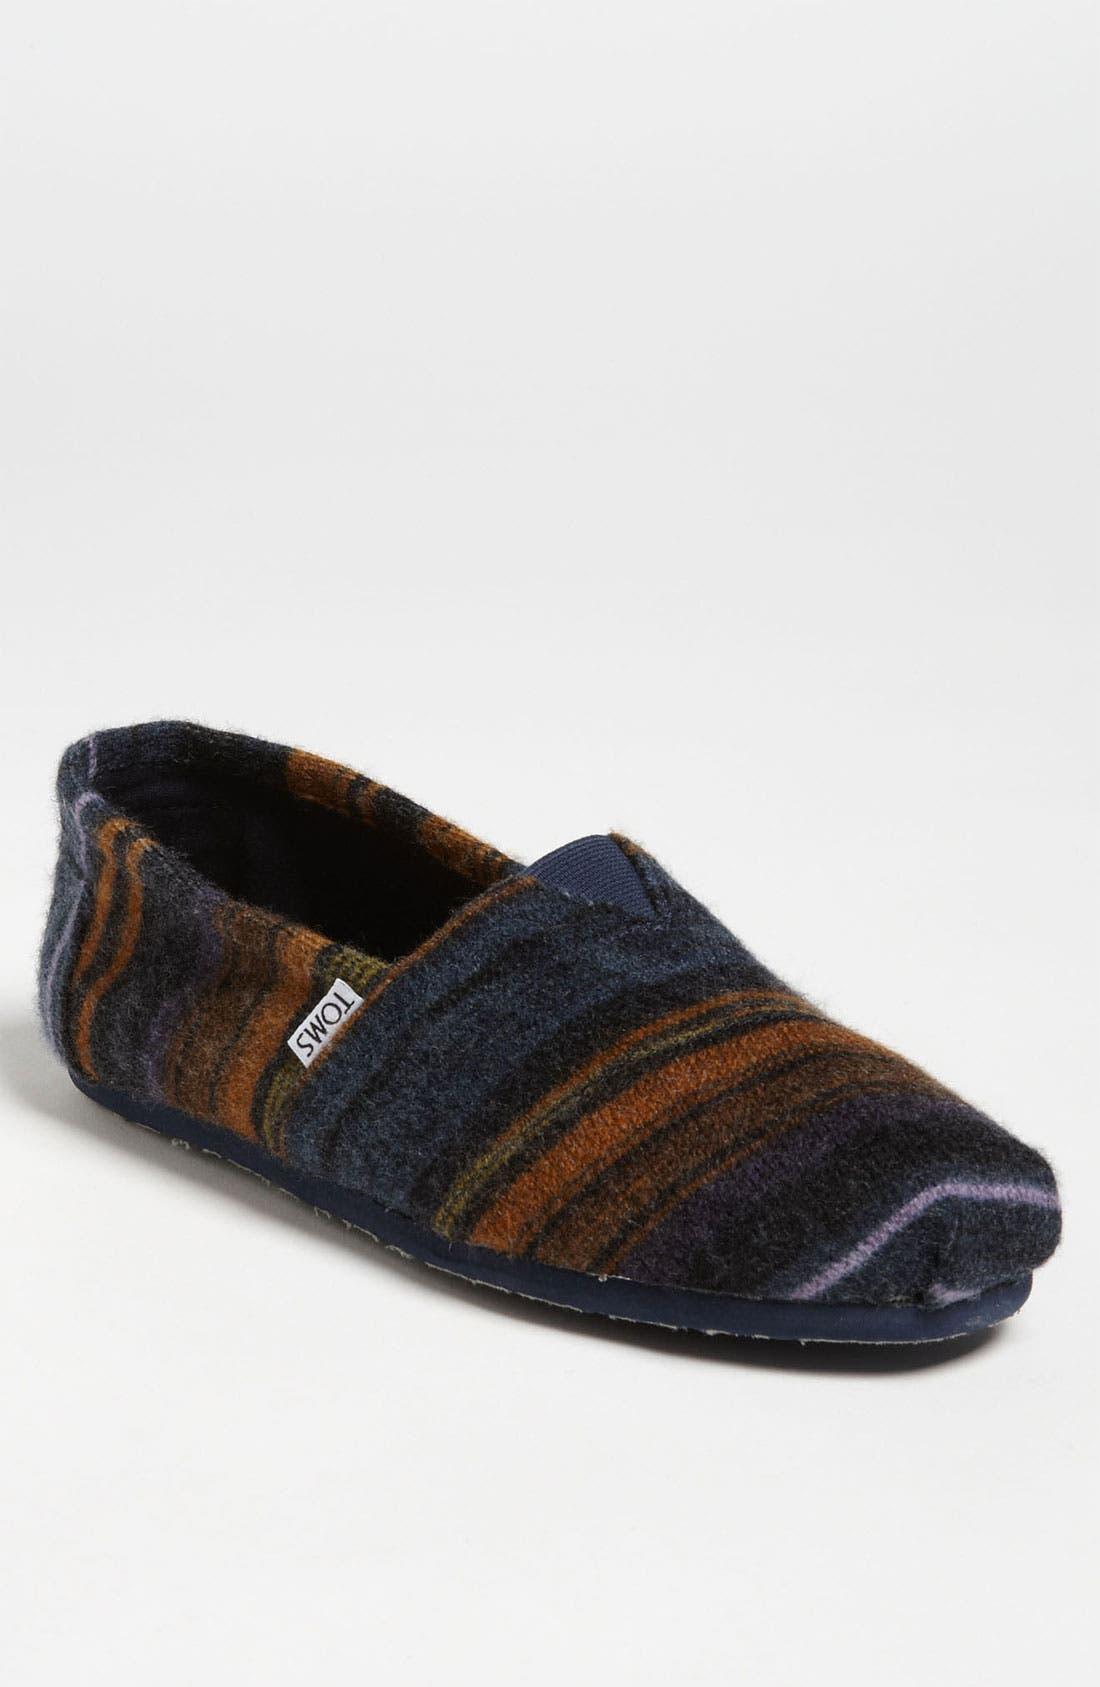 Alternate Image 1 Selected - TOMS 'Classic - Novelty Knit' Slip-On (Men)